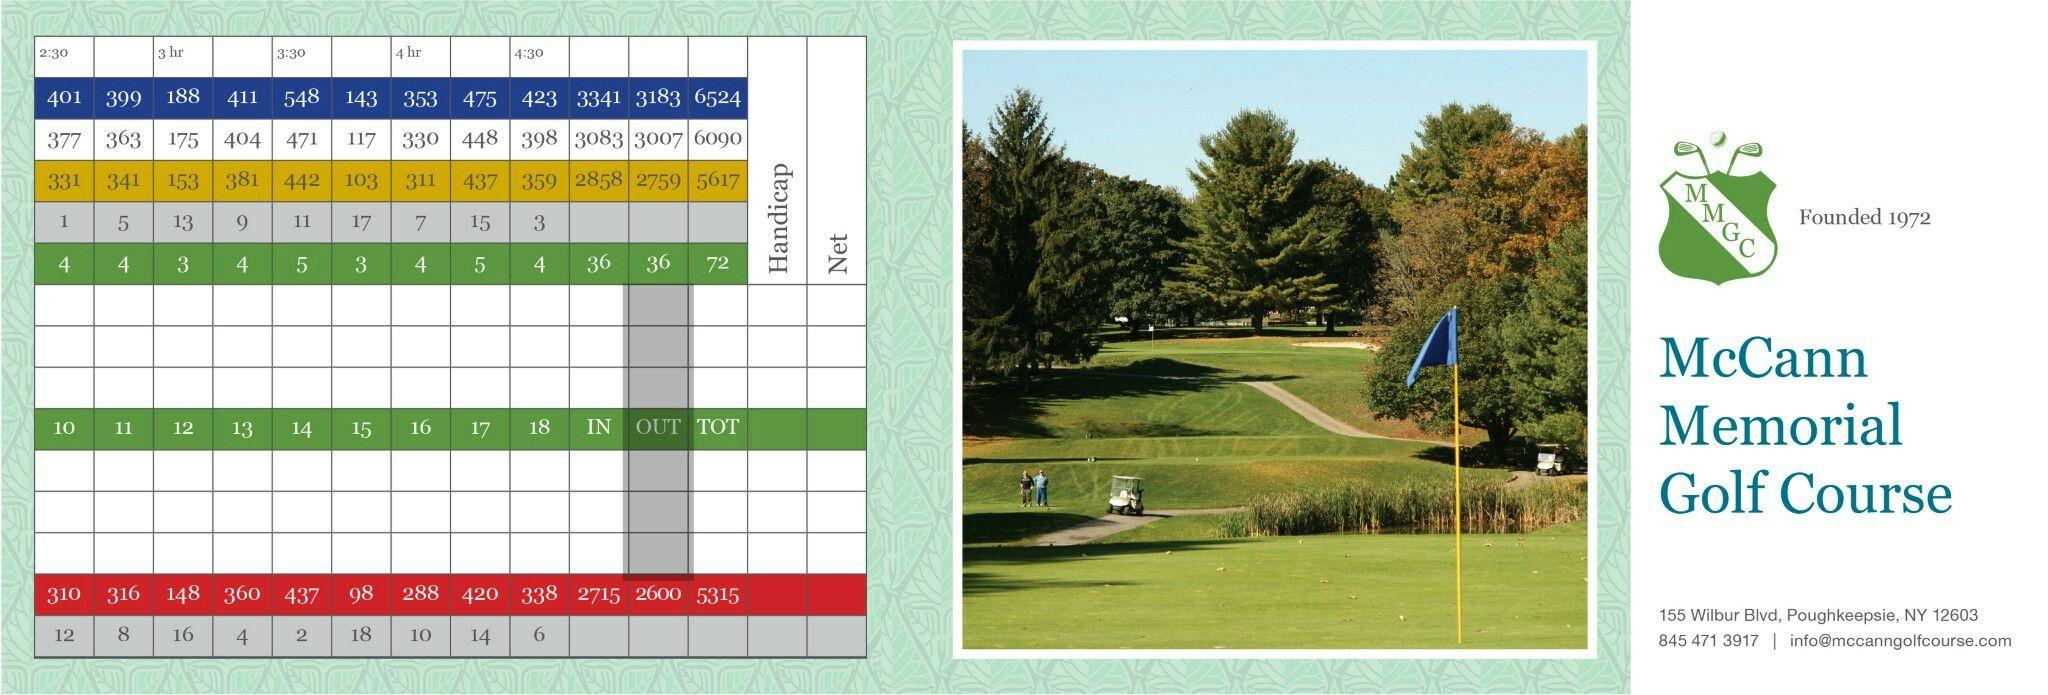 21+ Big oak golf course waterloo ny information